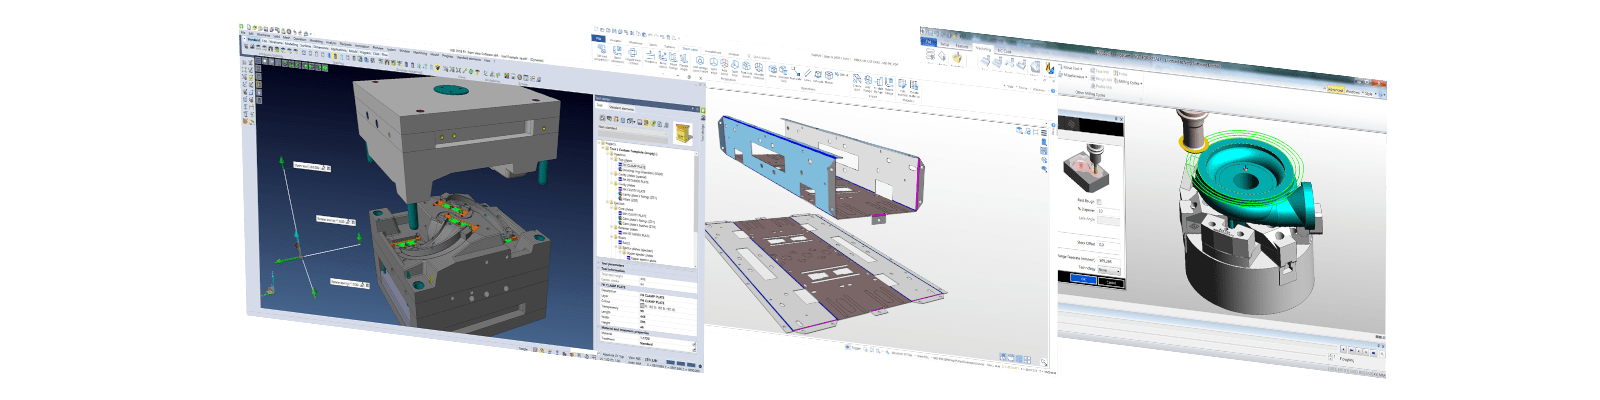 Hexagon Production Software